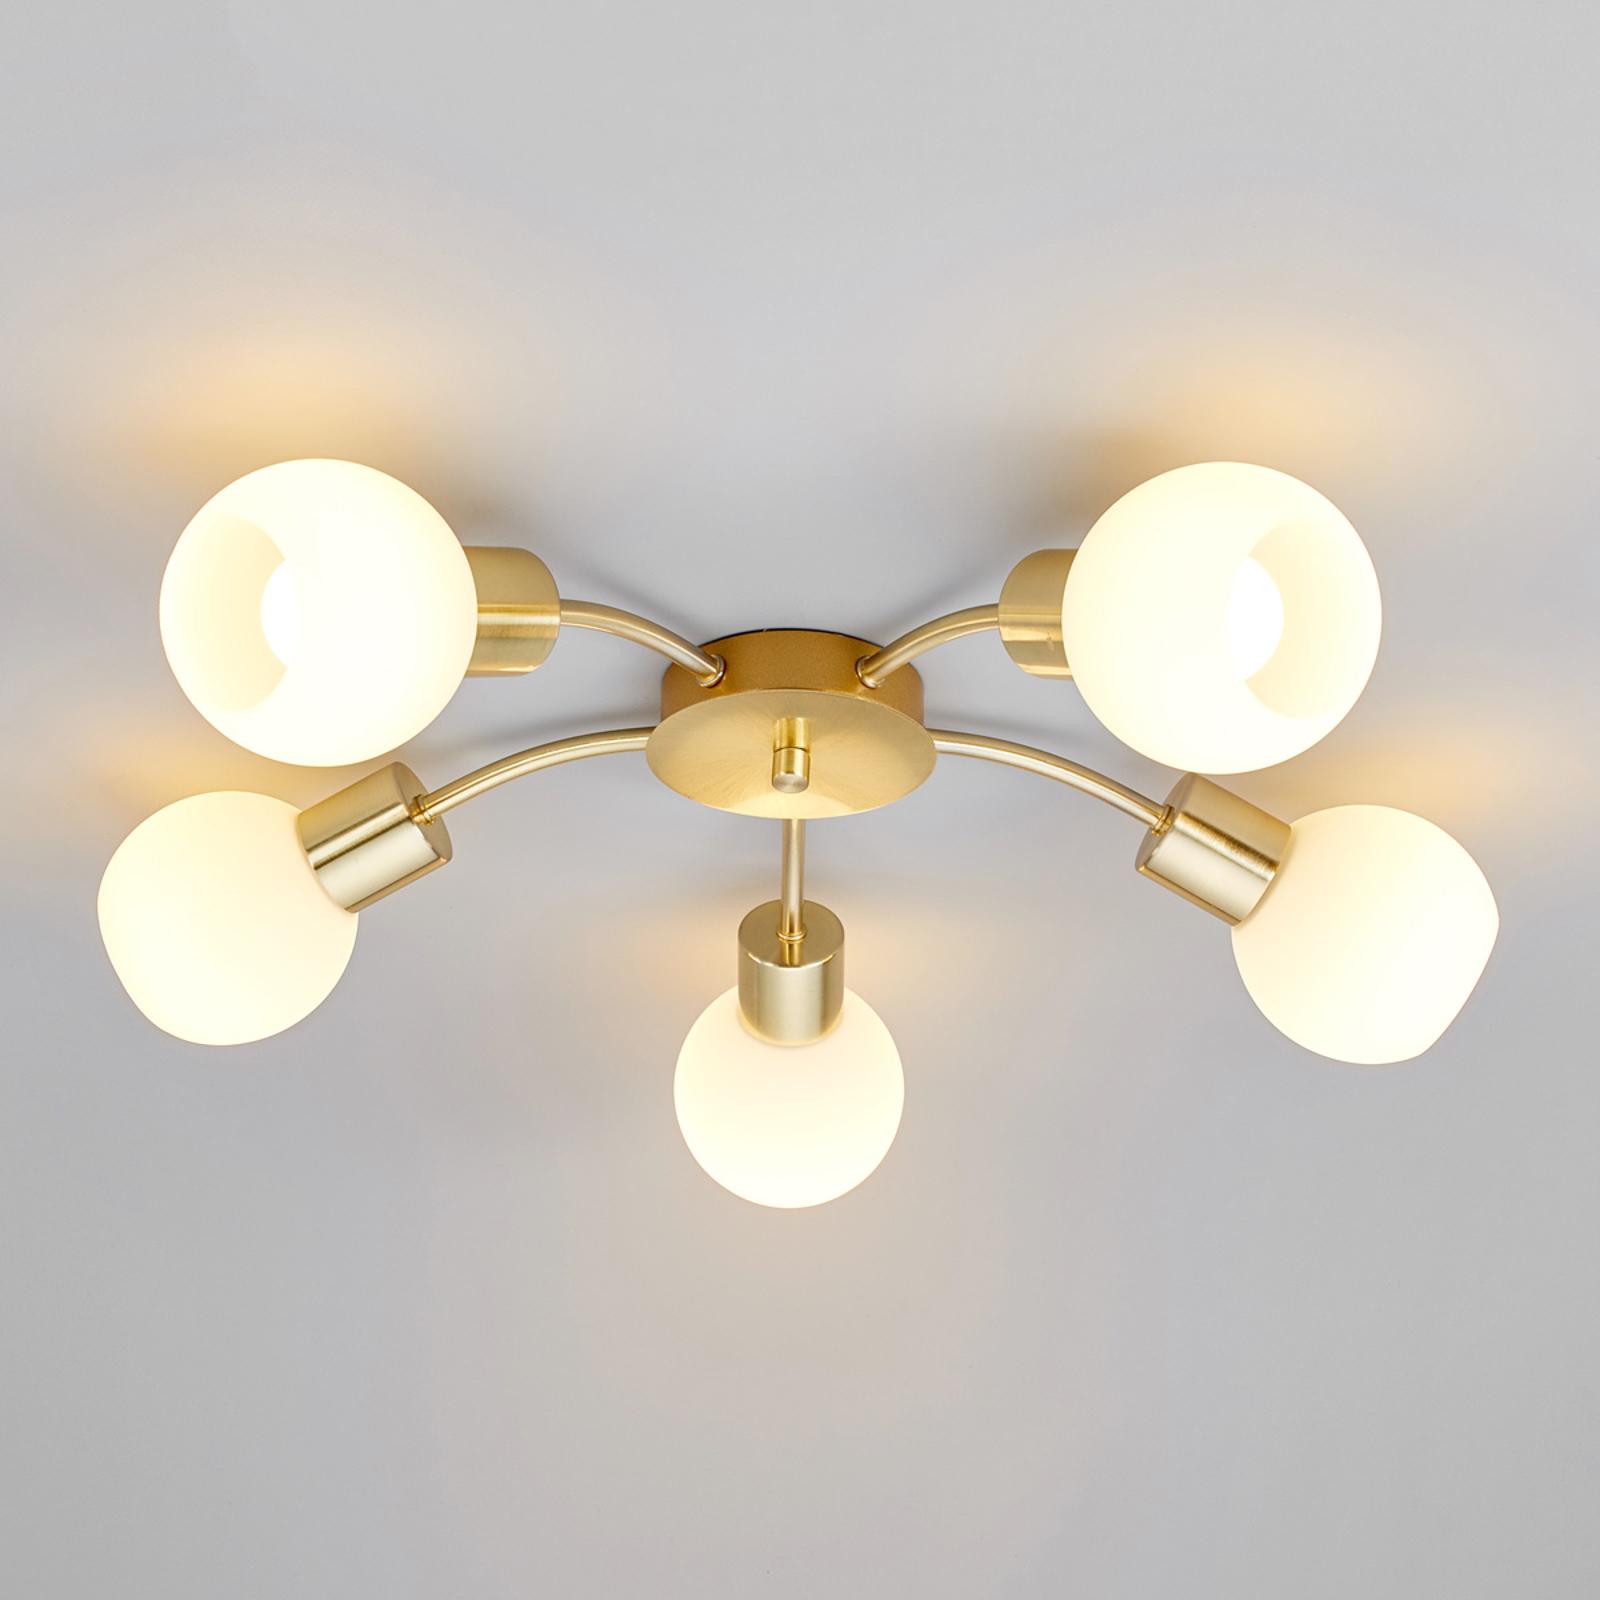 ELAINA - lampa sufitowa LED, mosiężna, 5-pkt.